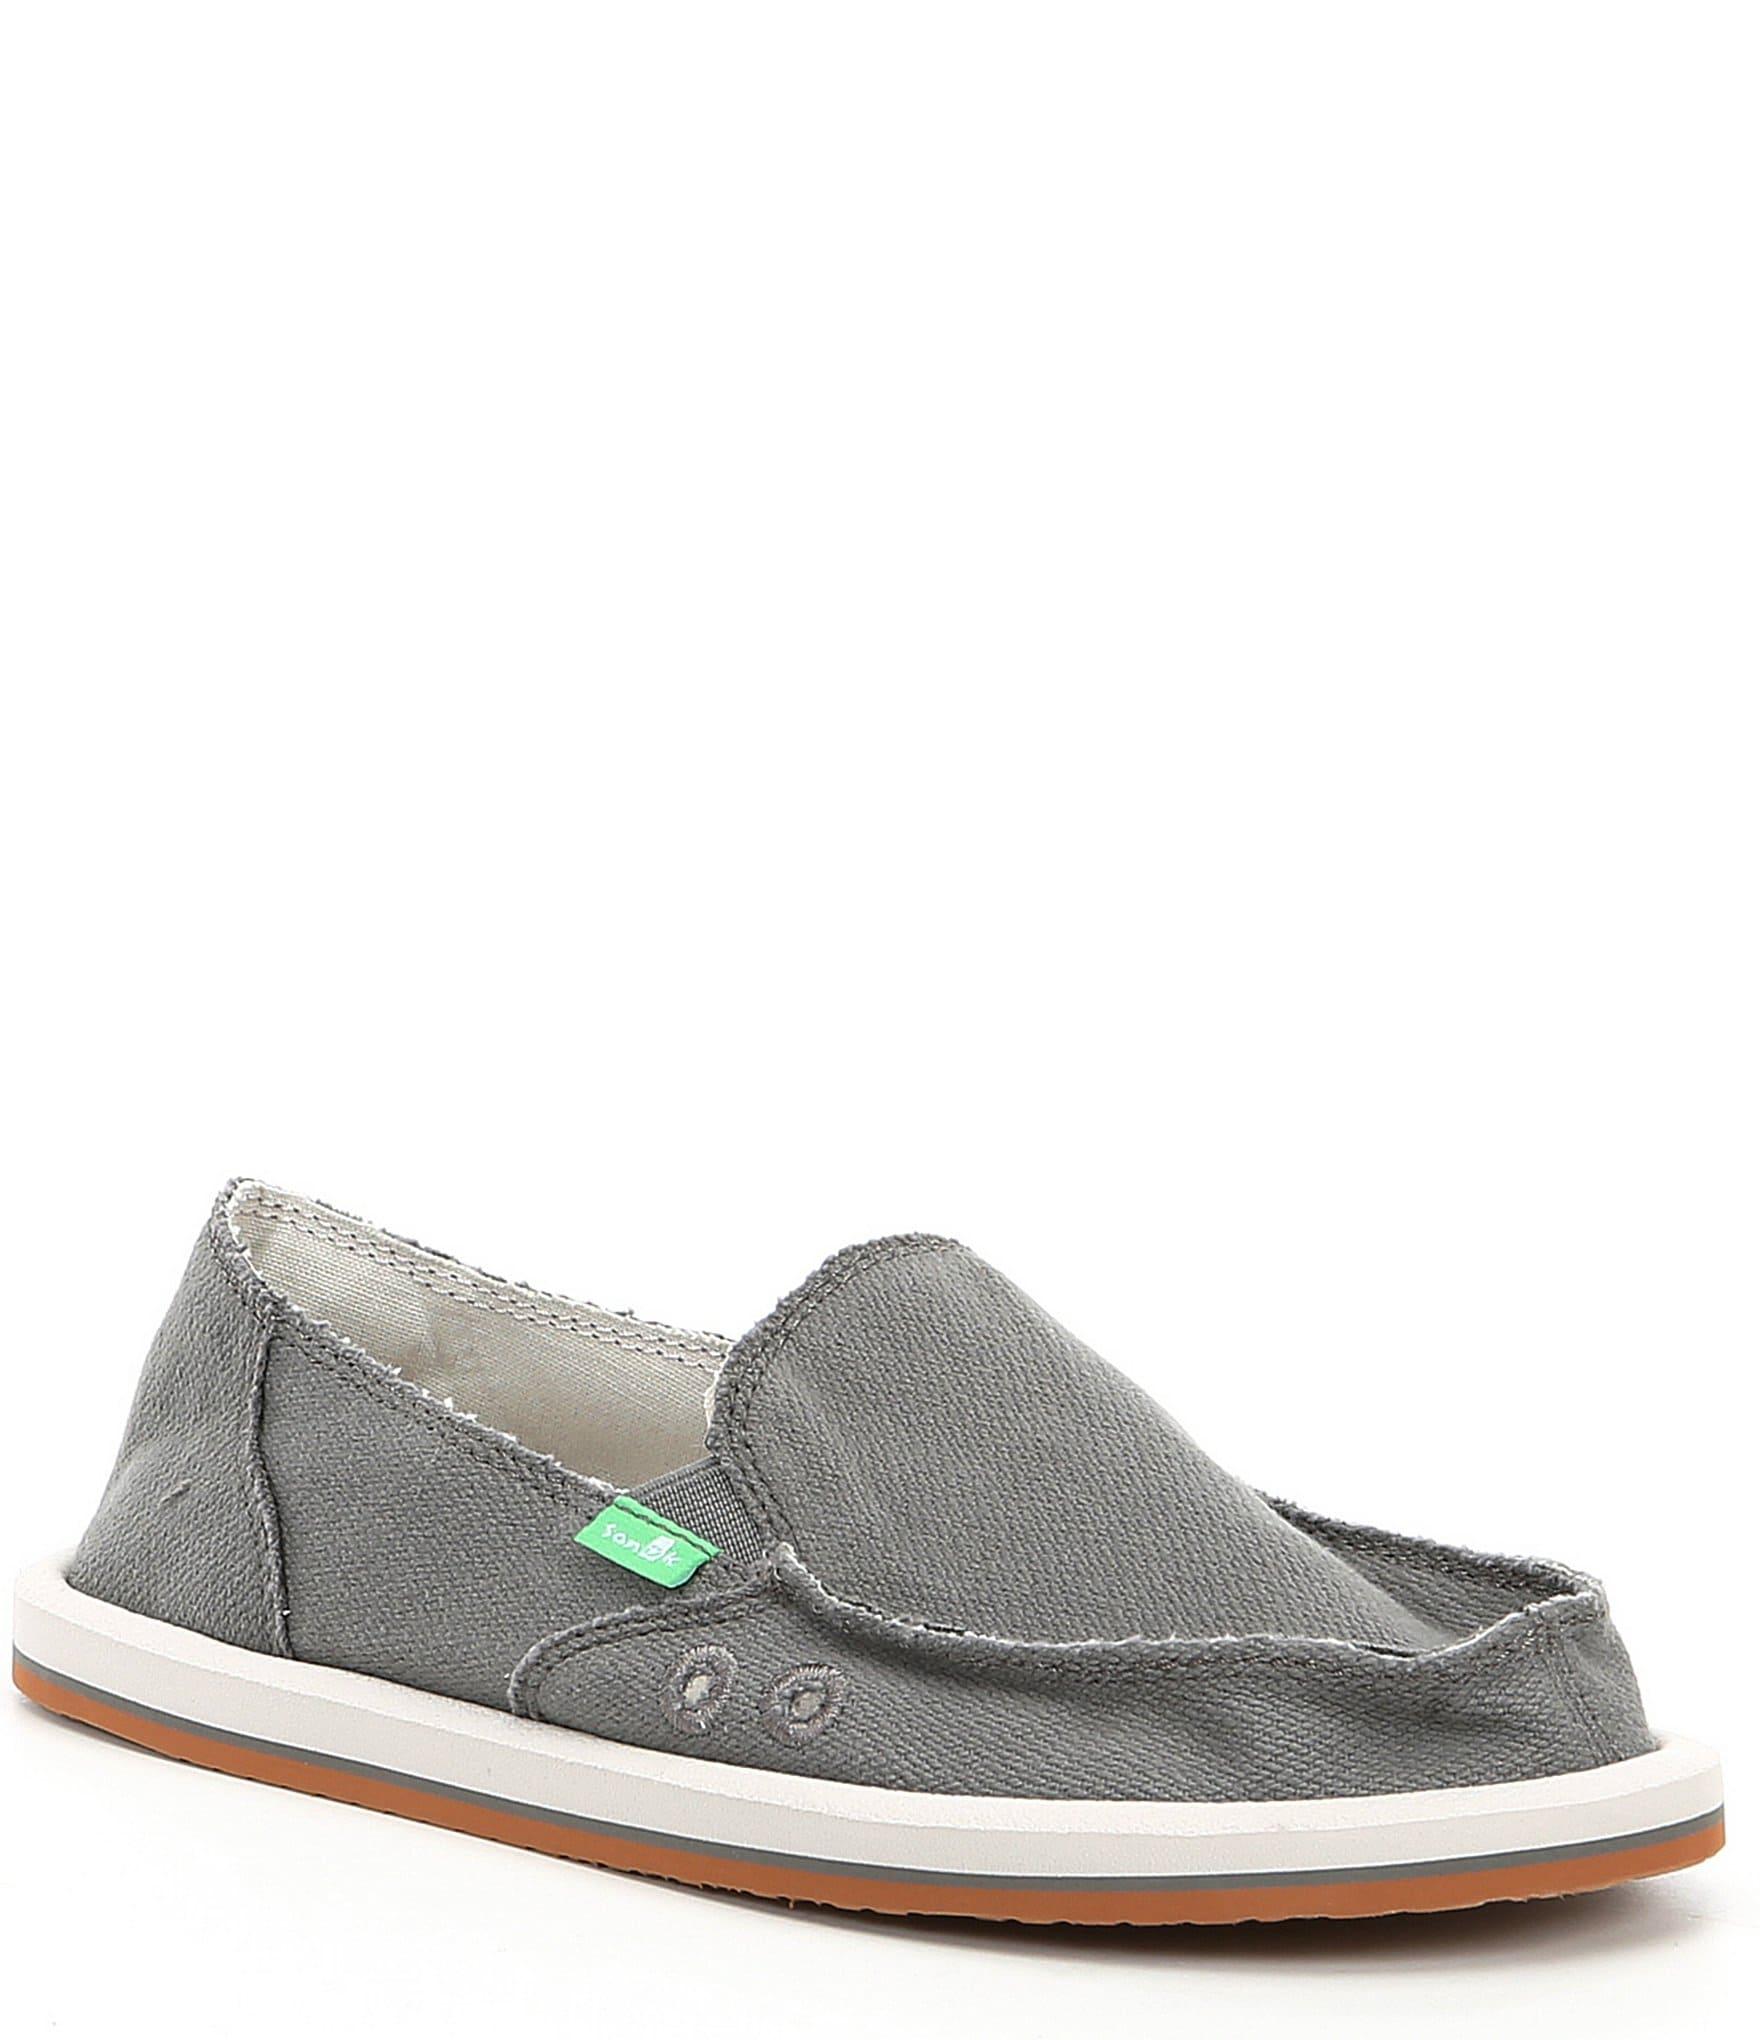 Sanuk Donna Hemp Slip On Shoes | Dillard's